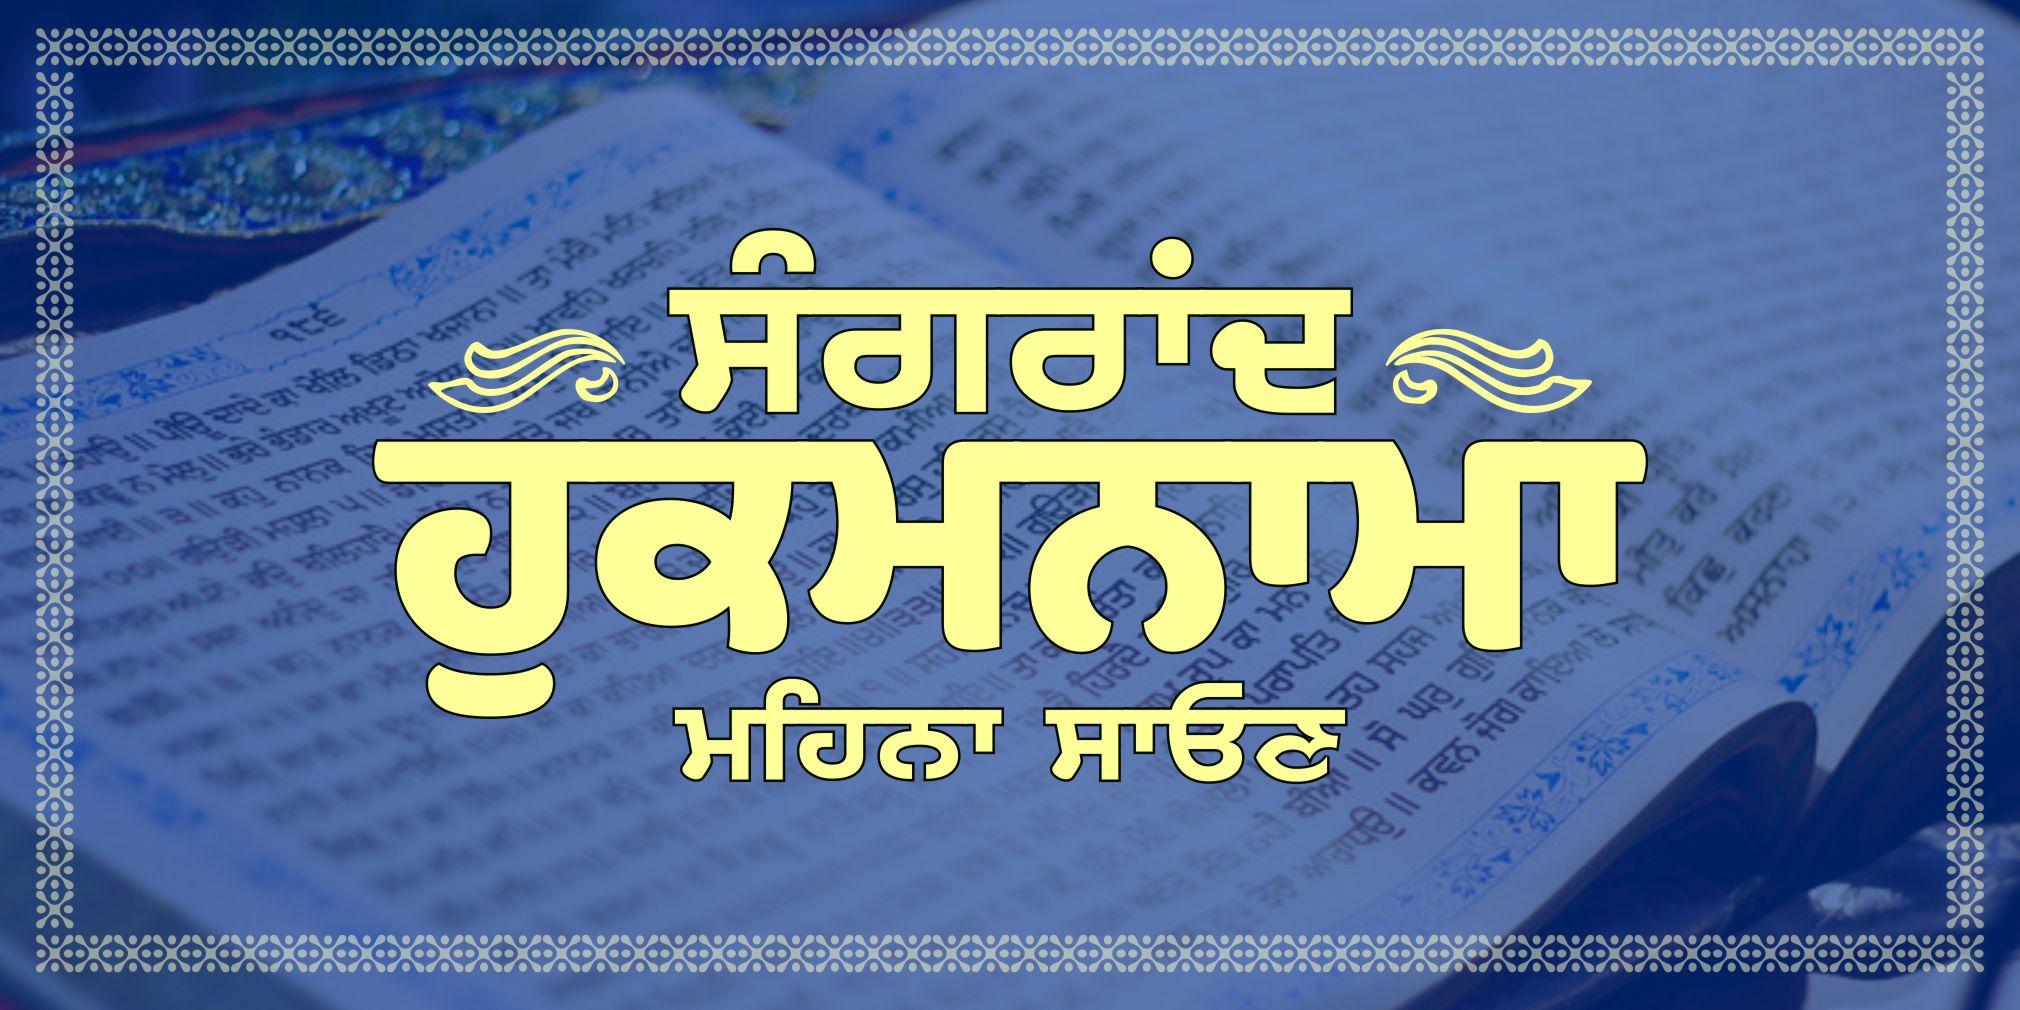 Sangrand Hukamnama Greetings Mahina Sawan - Dhansikhi